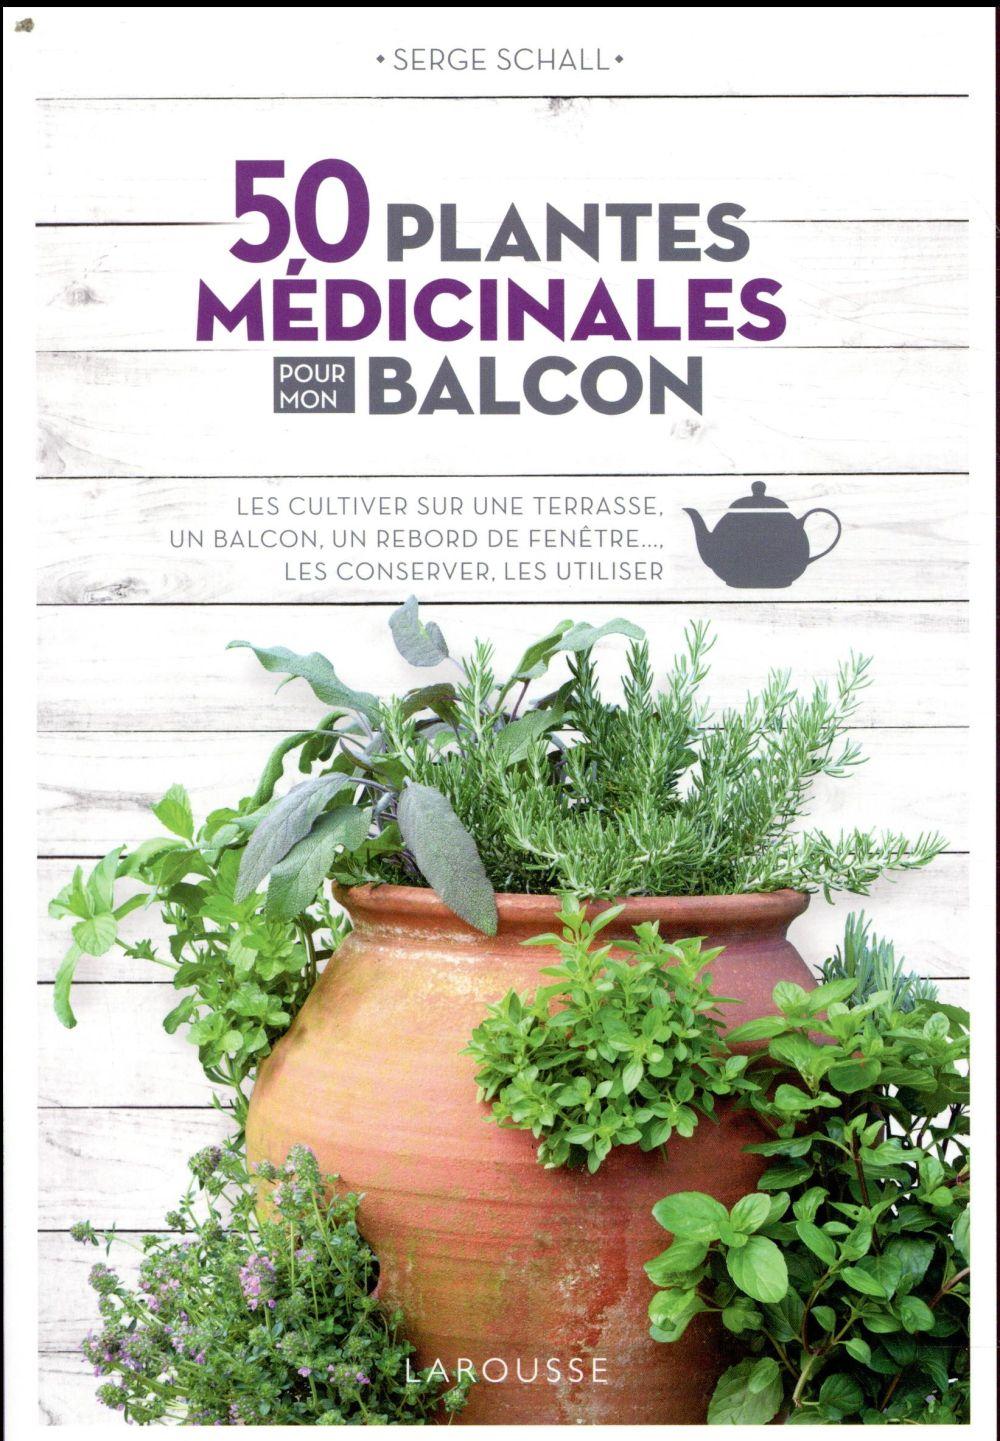 50 PLANTES MEDICINALES POUR MO